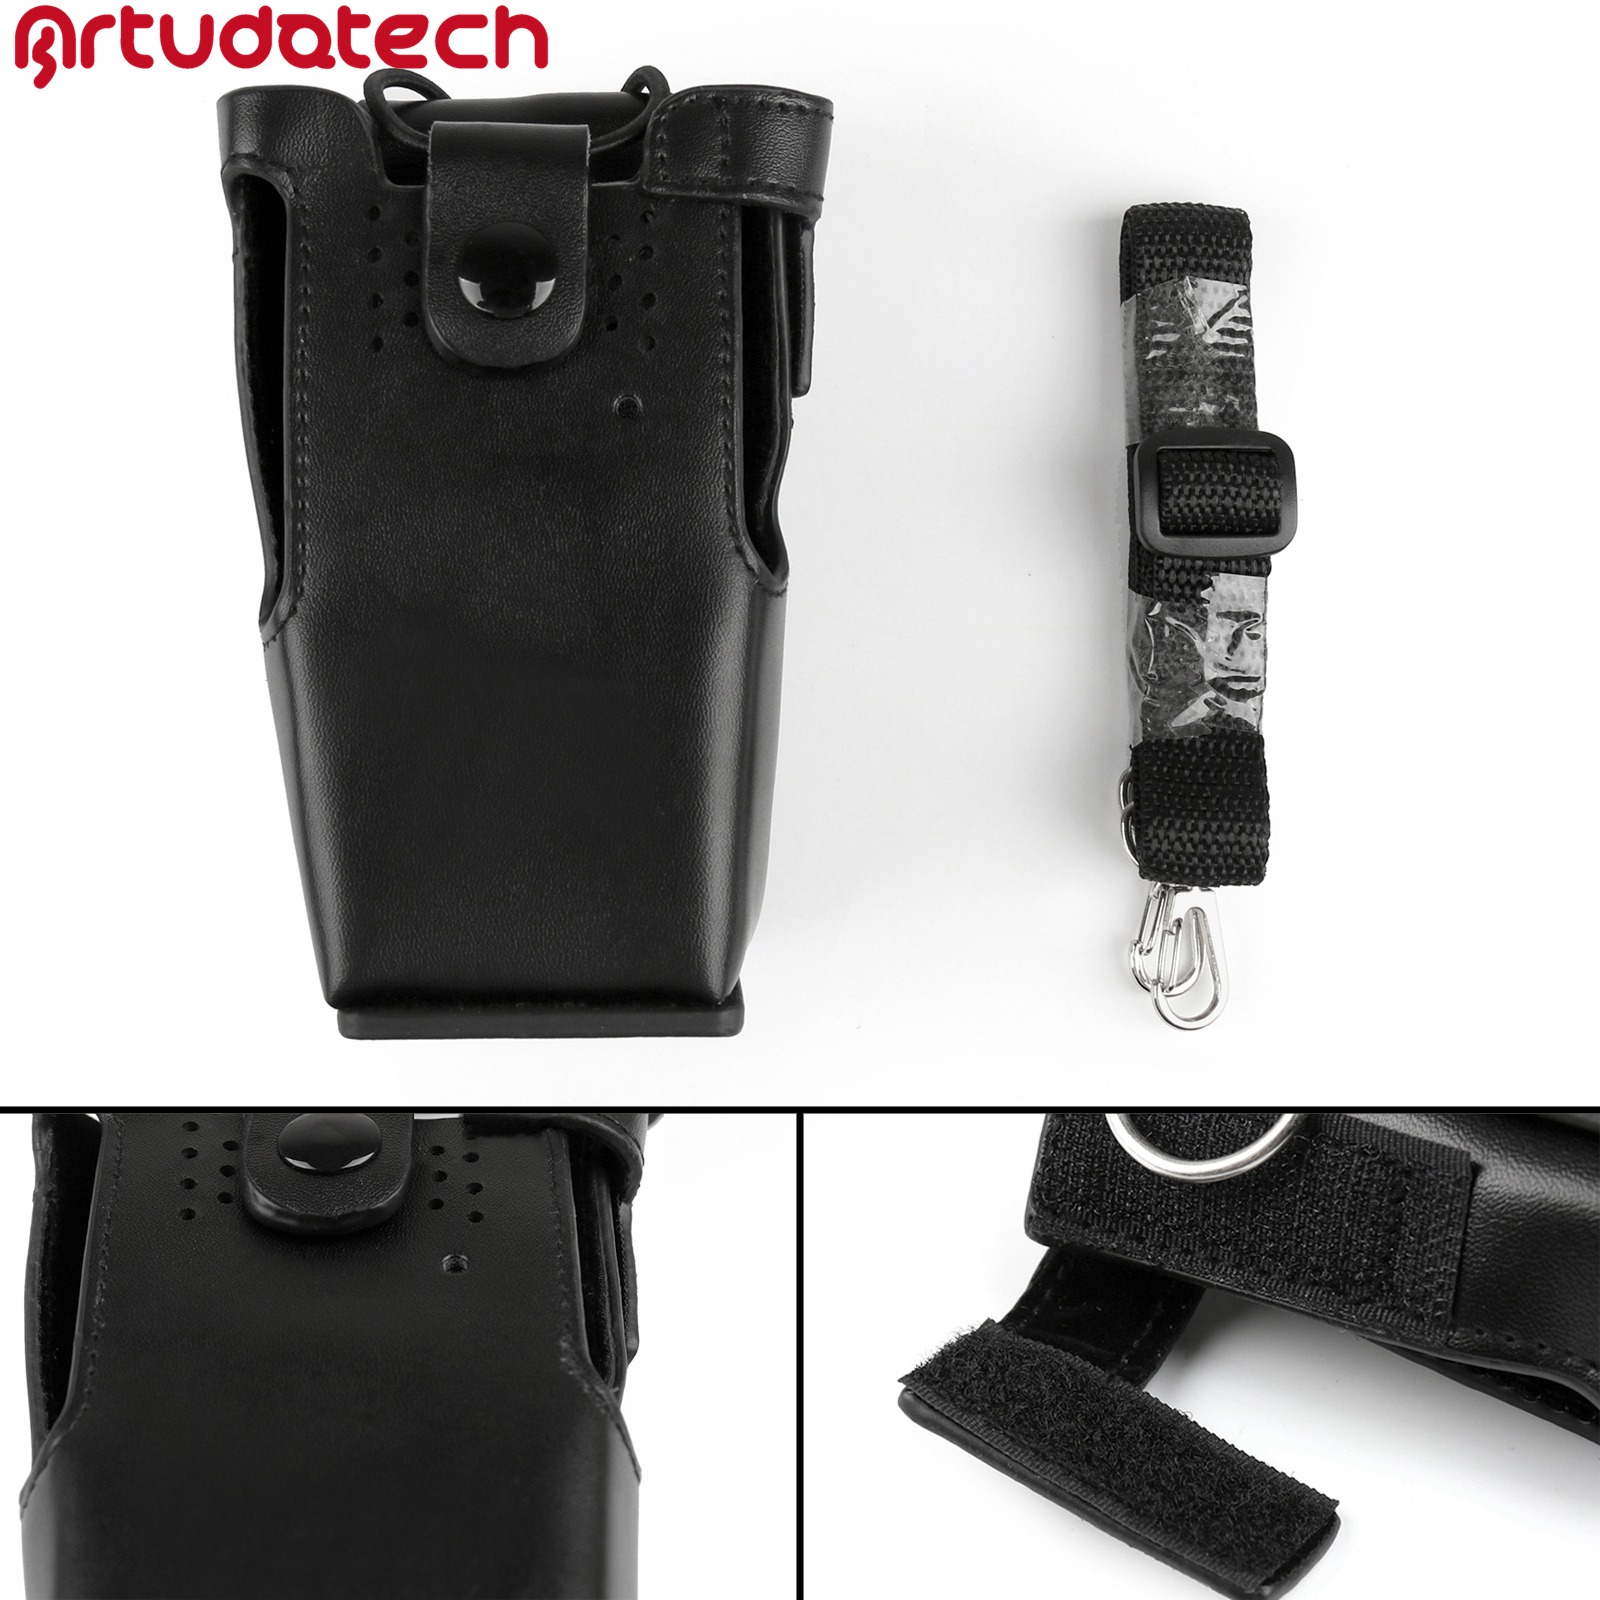 Artudatech Leather Holder Case For Motorola GP32 GP340 GP380 GP3188 PRO5150 HT750 HT1250 EP450 Accessories